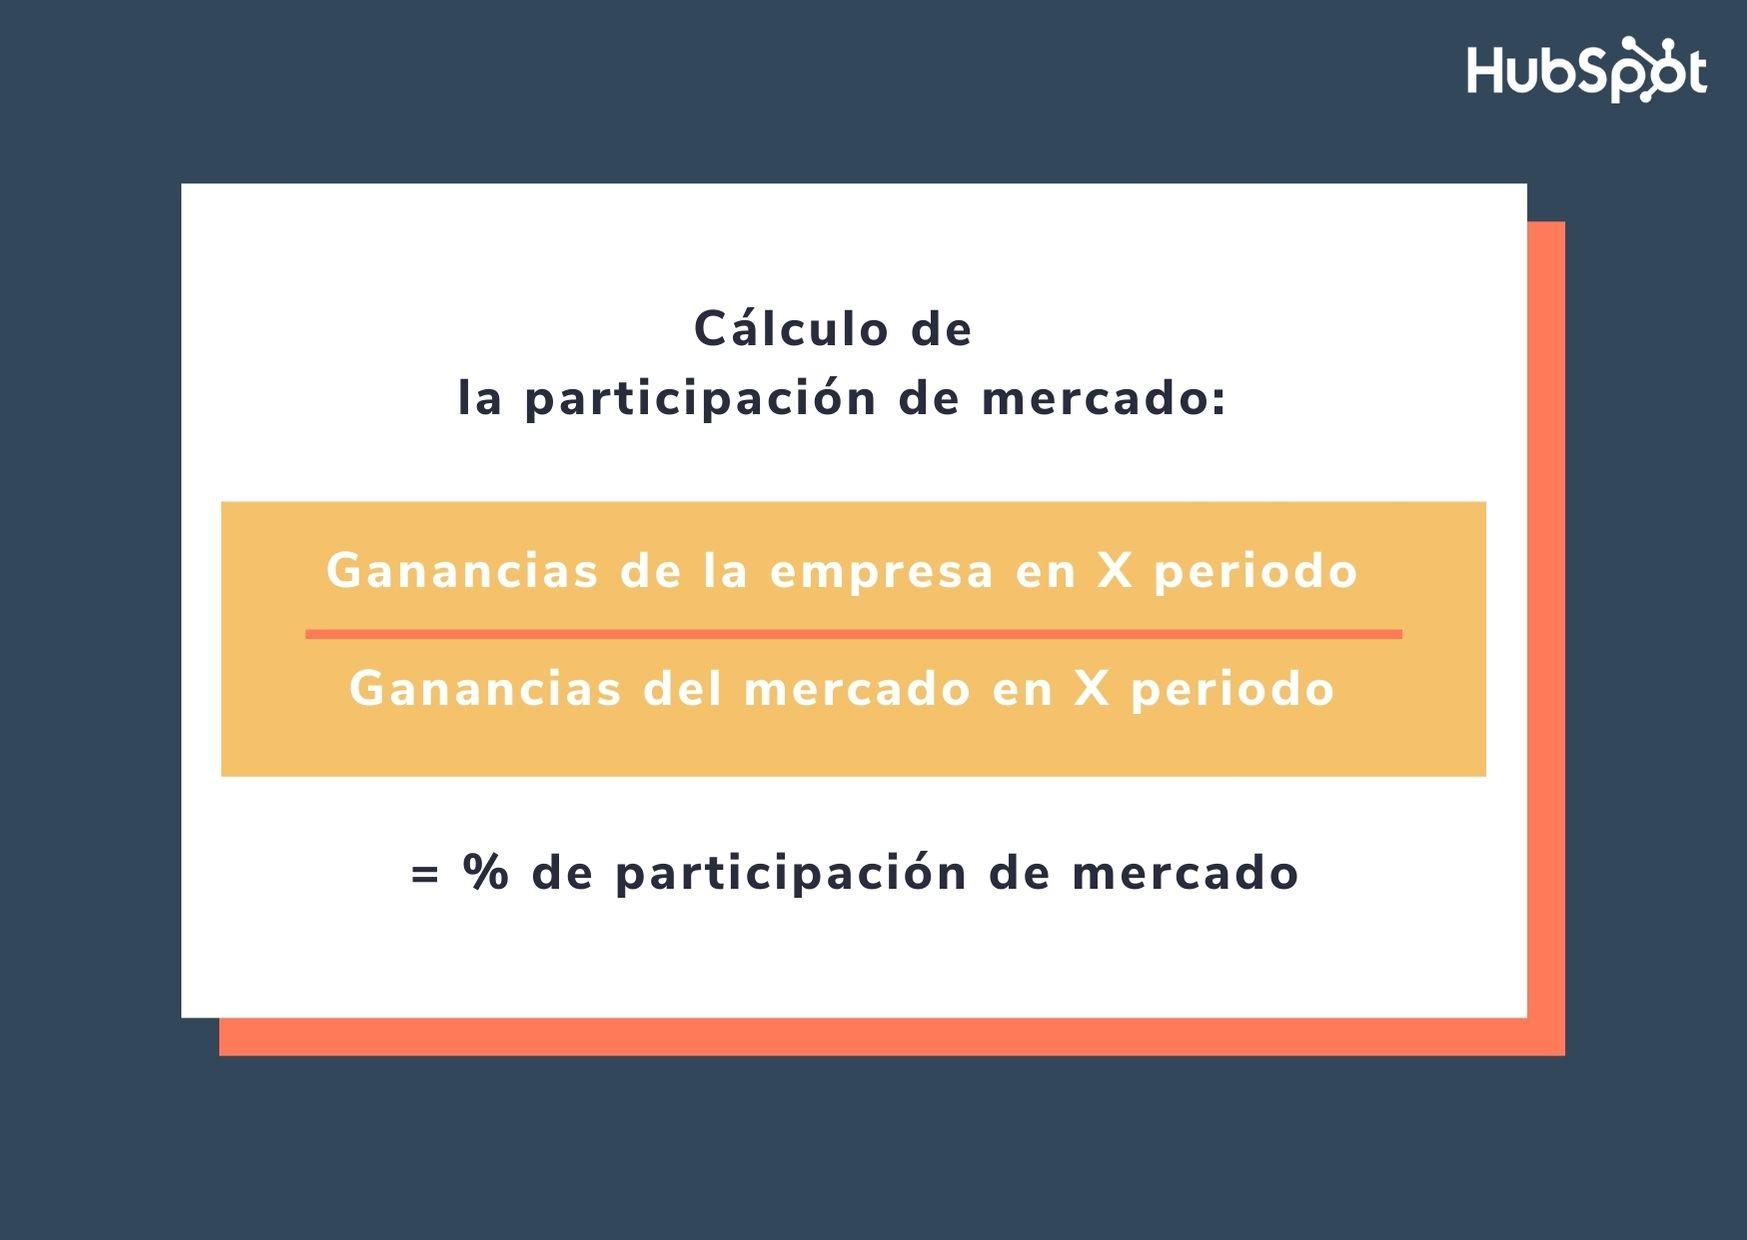 Fórmula para calcular el market share o participación de mercado